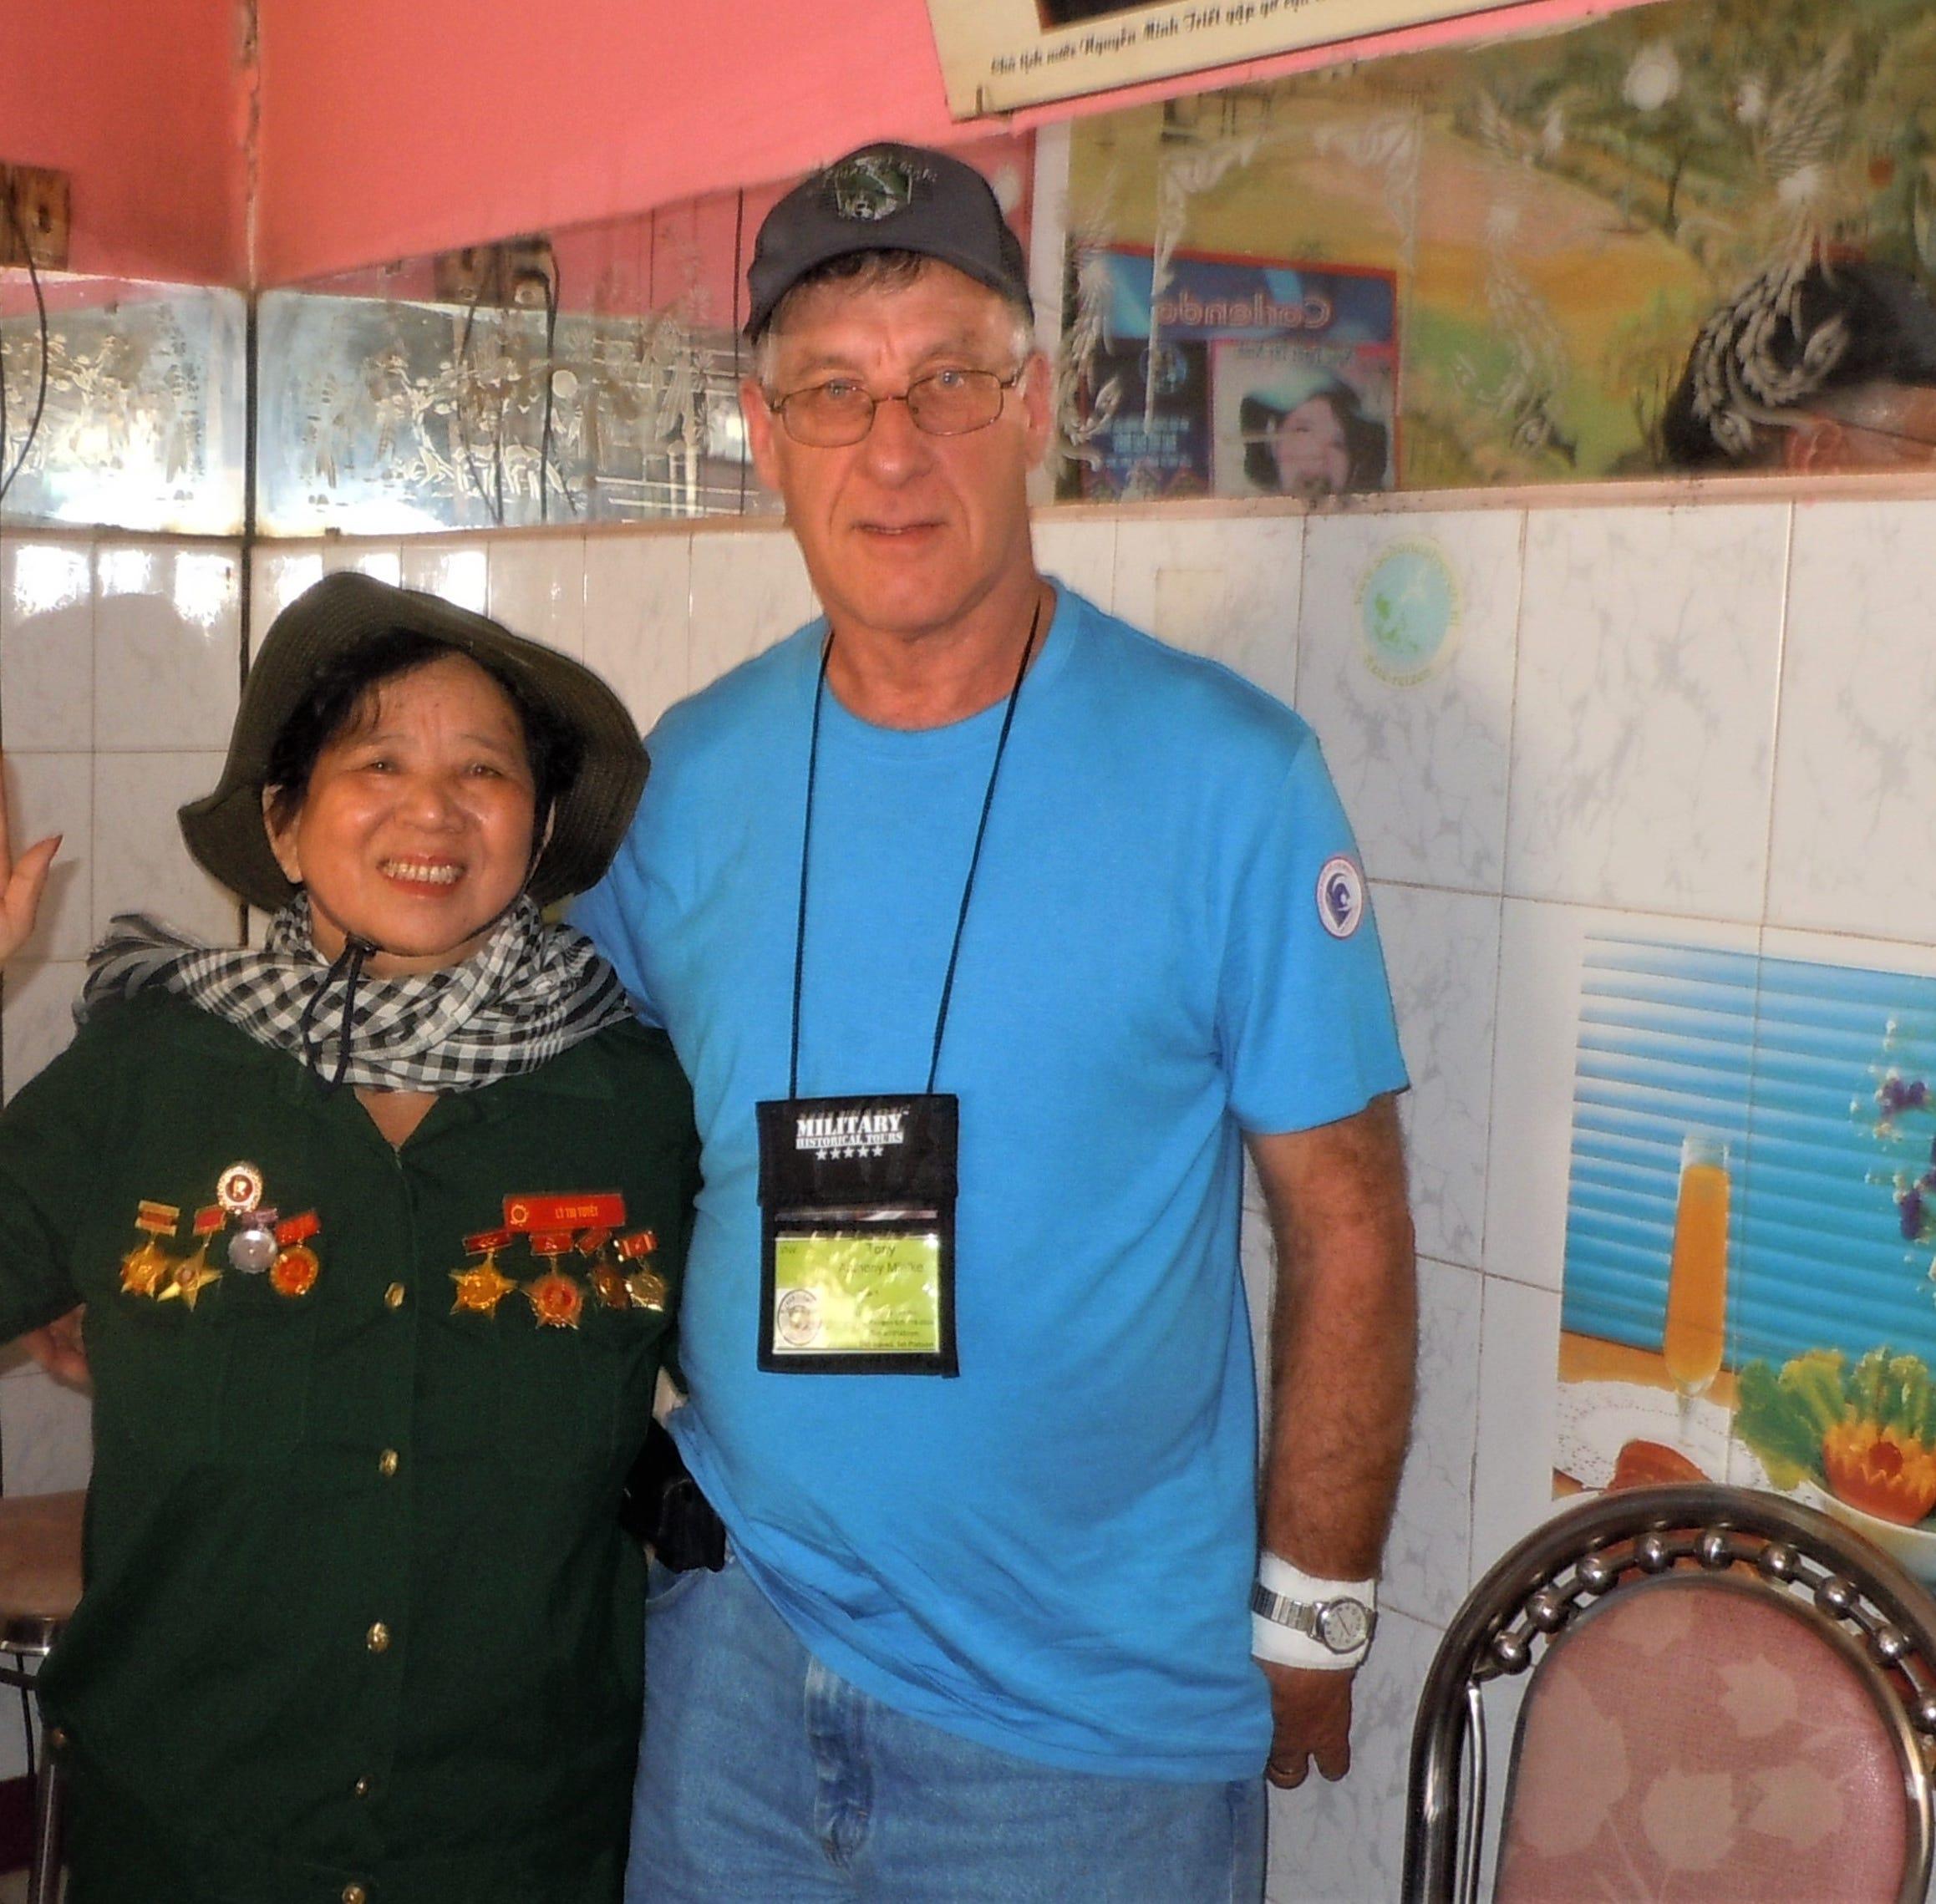 Fond du Lac veteran calls return trip to Vietnam 'a chance of a lifetime'